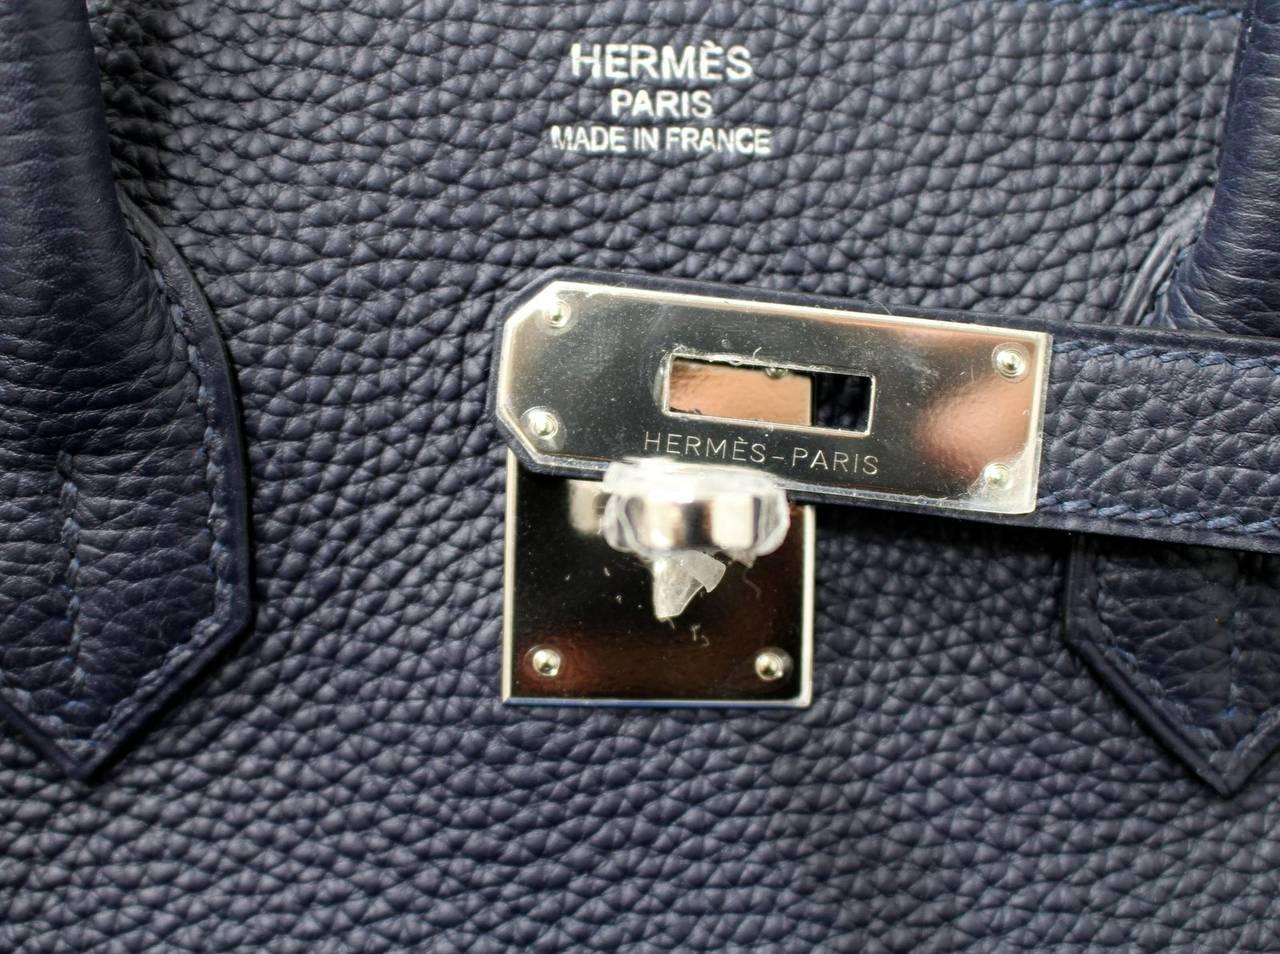 Hermes 35 cm Navy Blue Nuit Togo Leather Birkin with Palladium 6